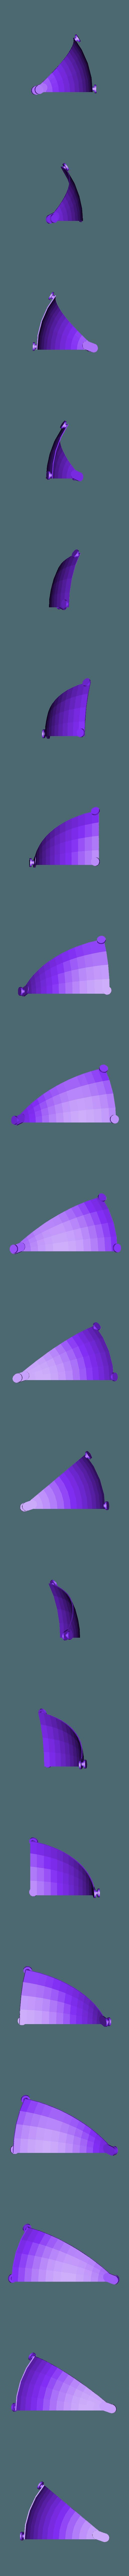 Bottom-Front.stl Download free STL file Flexible Filament Bikini Top and Bottom • 3D printable design, SexyCyborg